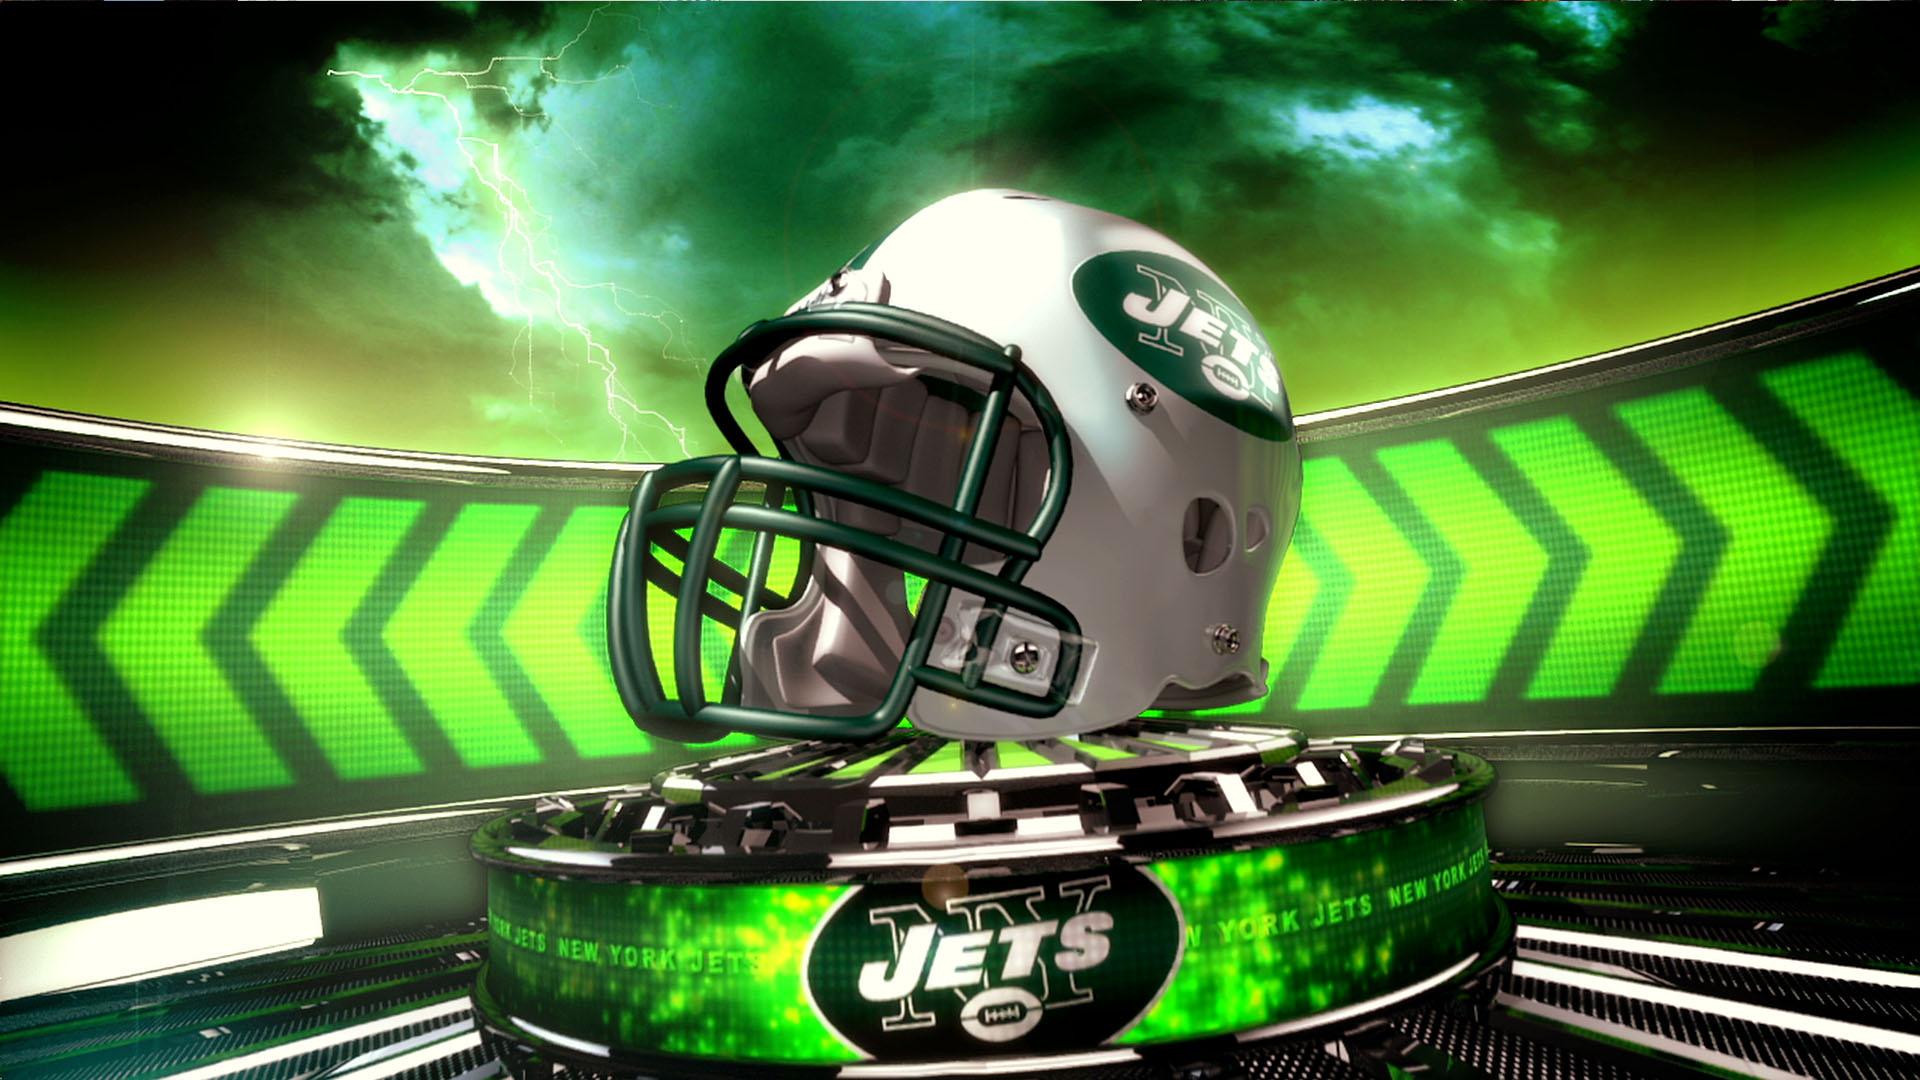 New York Jets Wallpaper 1920x1080 73373